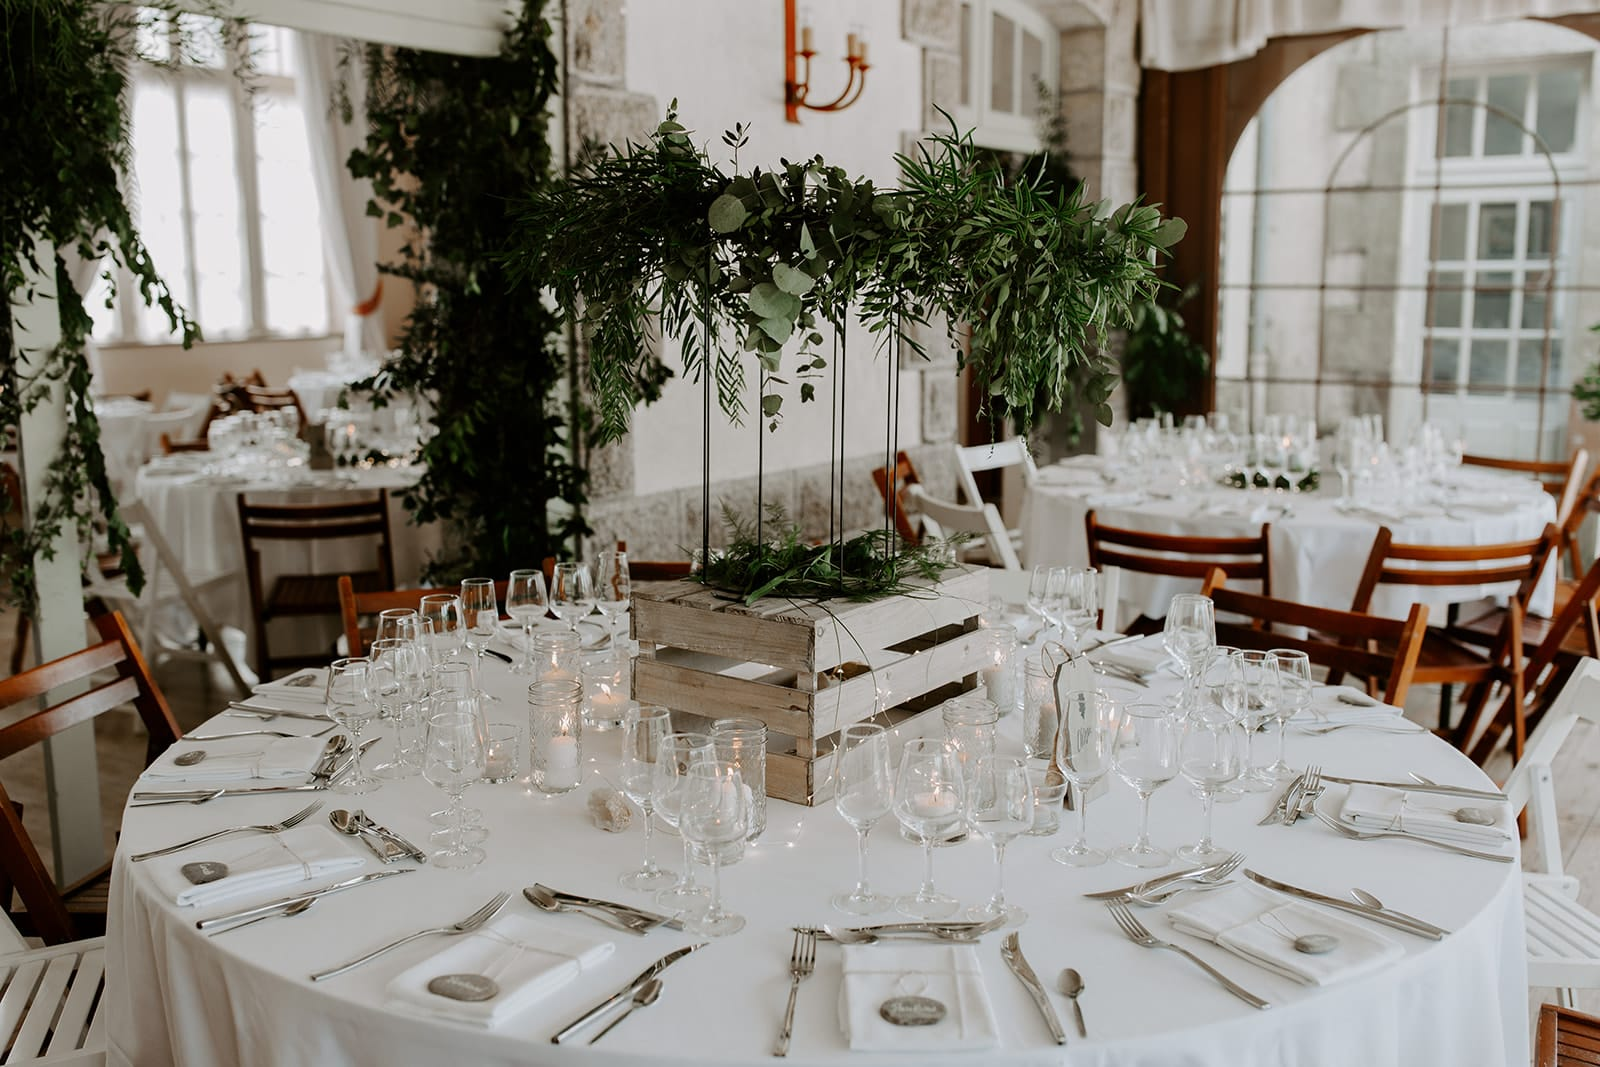 mariage_chateau_la_flocelliere_vendee_flavie_nelly_photographe-48-obonheurdesdames-decoration-mariage-location-vegetal